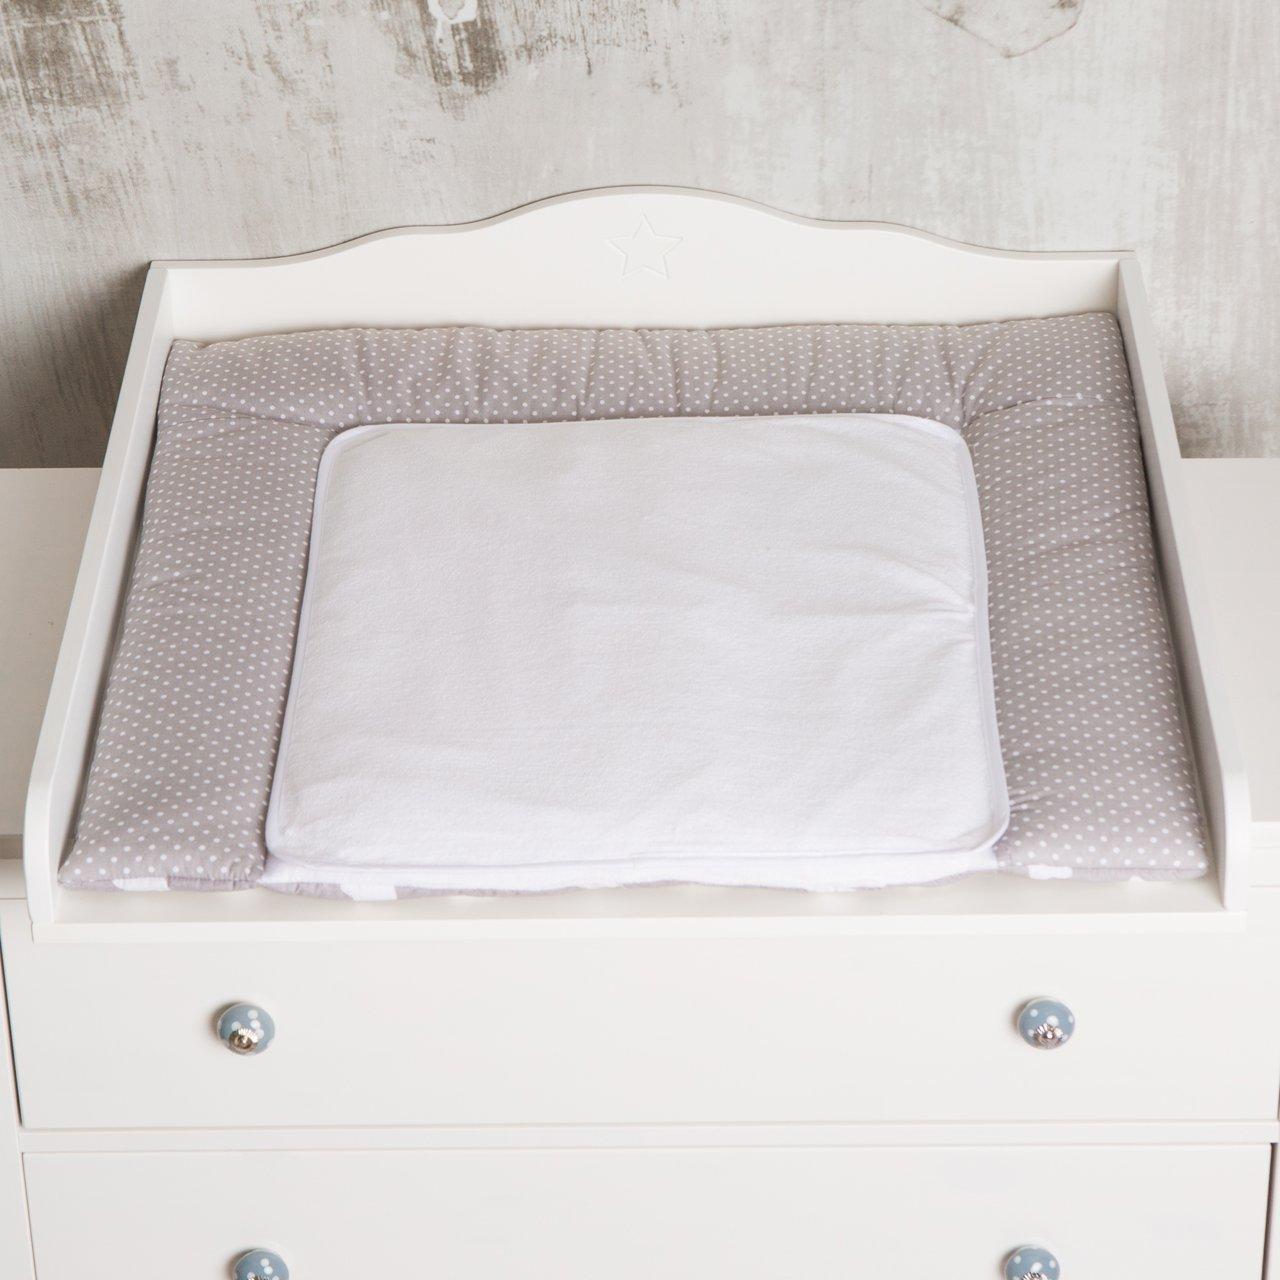 Wickelaufsatz für IKEA Hemnes, Hurdal Kommode in weiß: Amazon.de: Baby